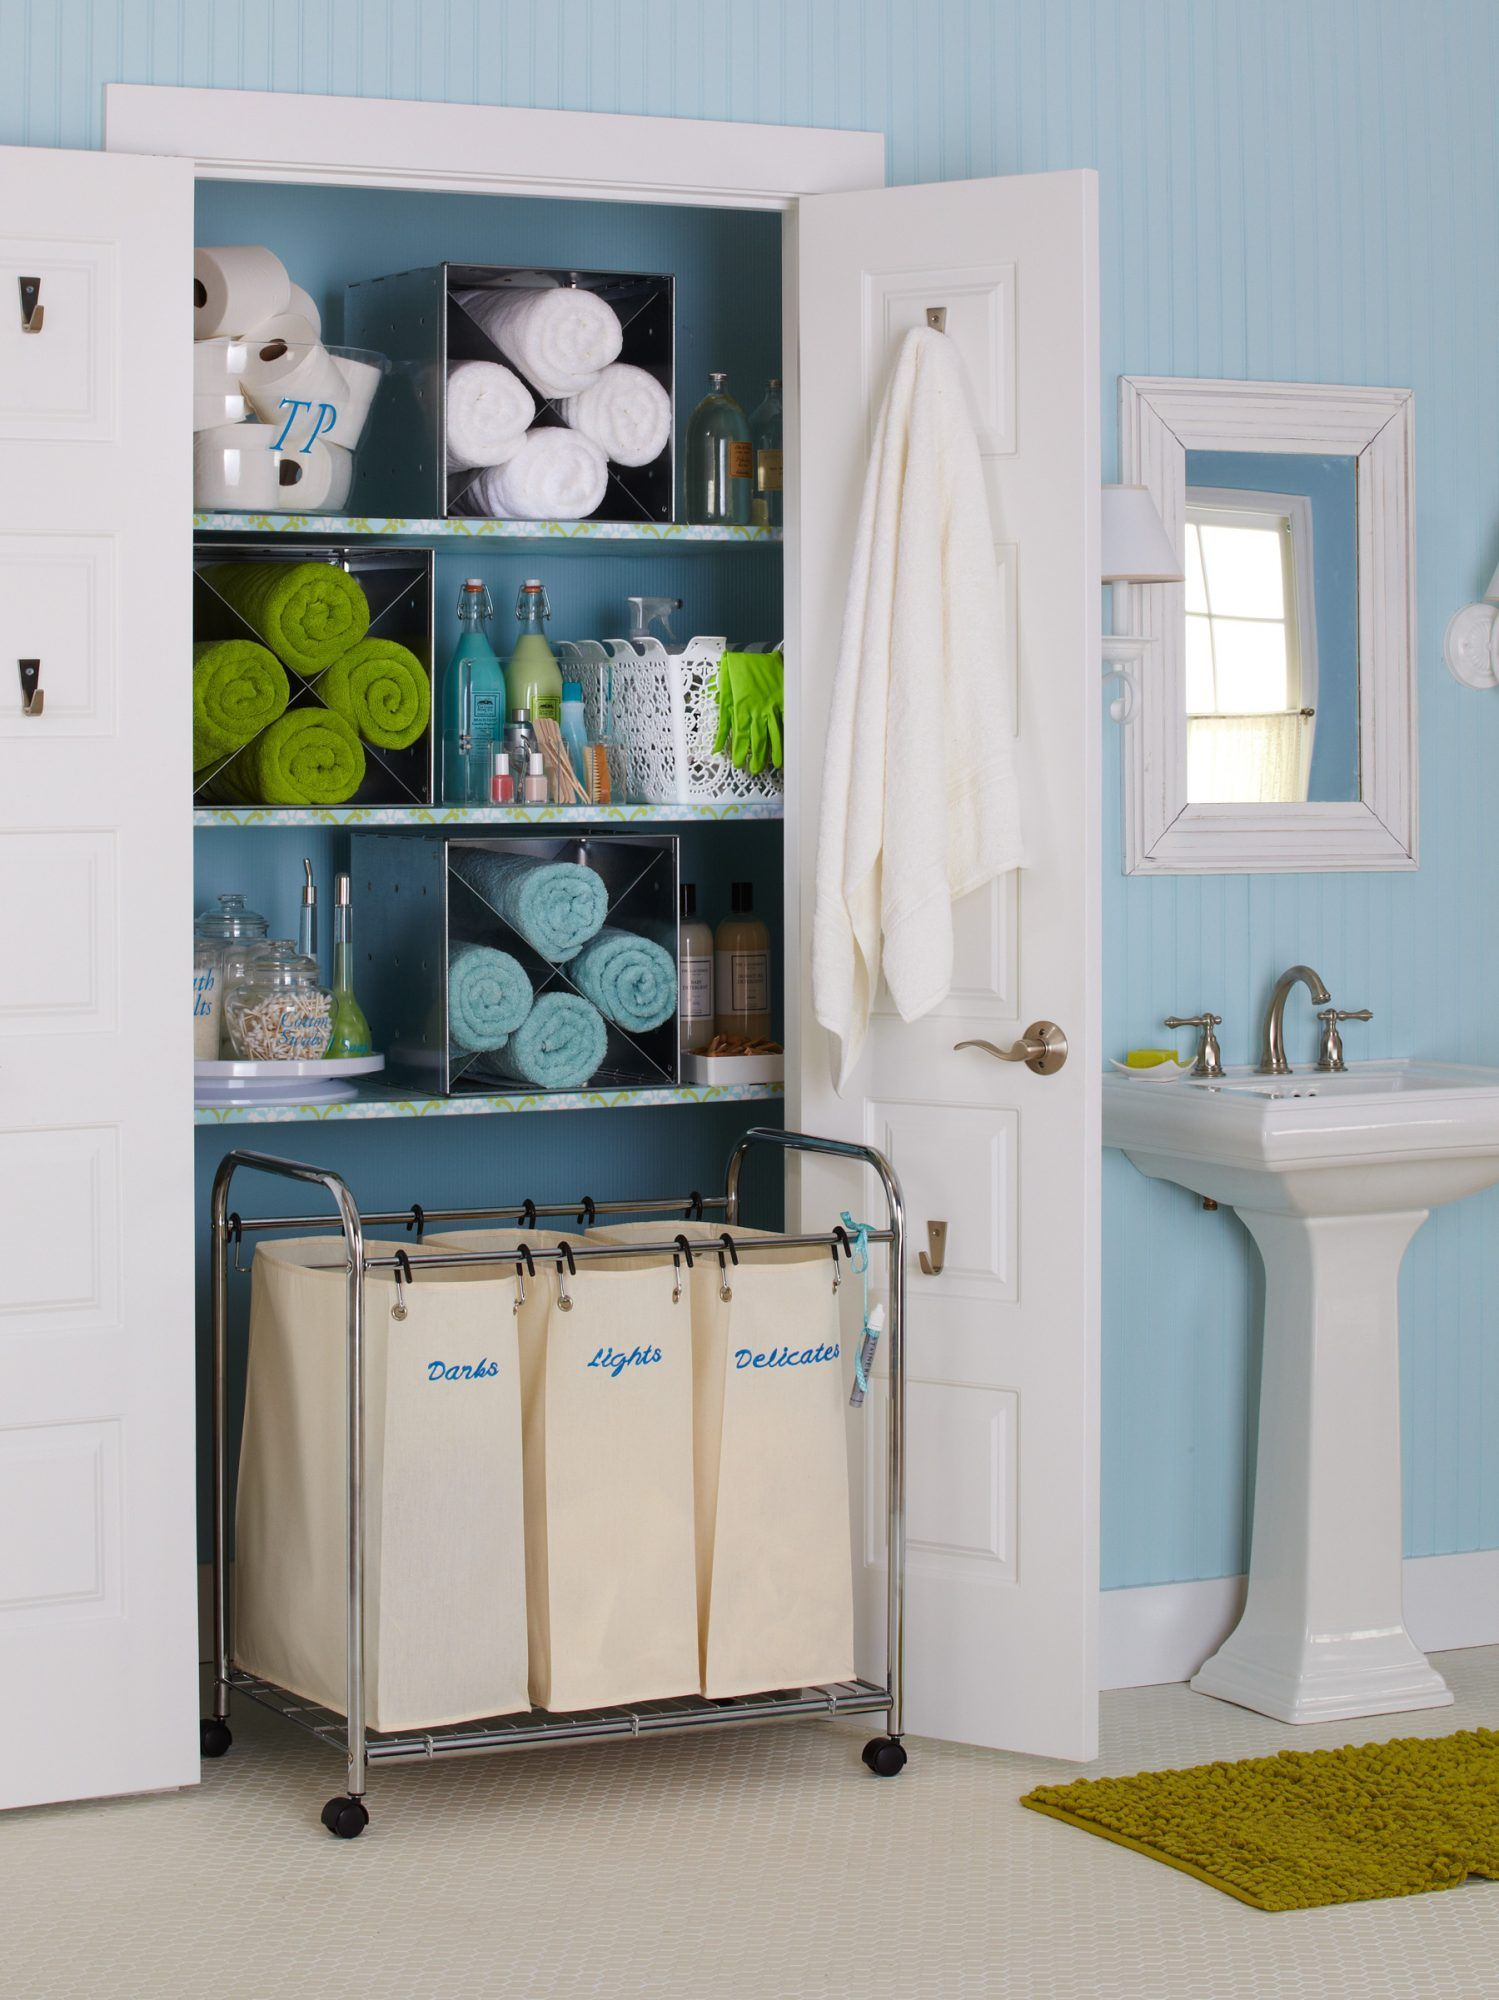 28 Towel Display Ideas For Pretty And Practical Bathroom Storage In 2020 Bathroom Closet Storage Closet Room Organizer Closet Hacks Organizing